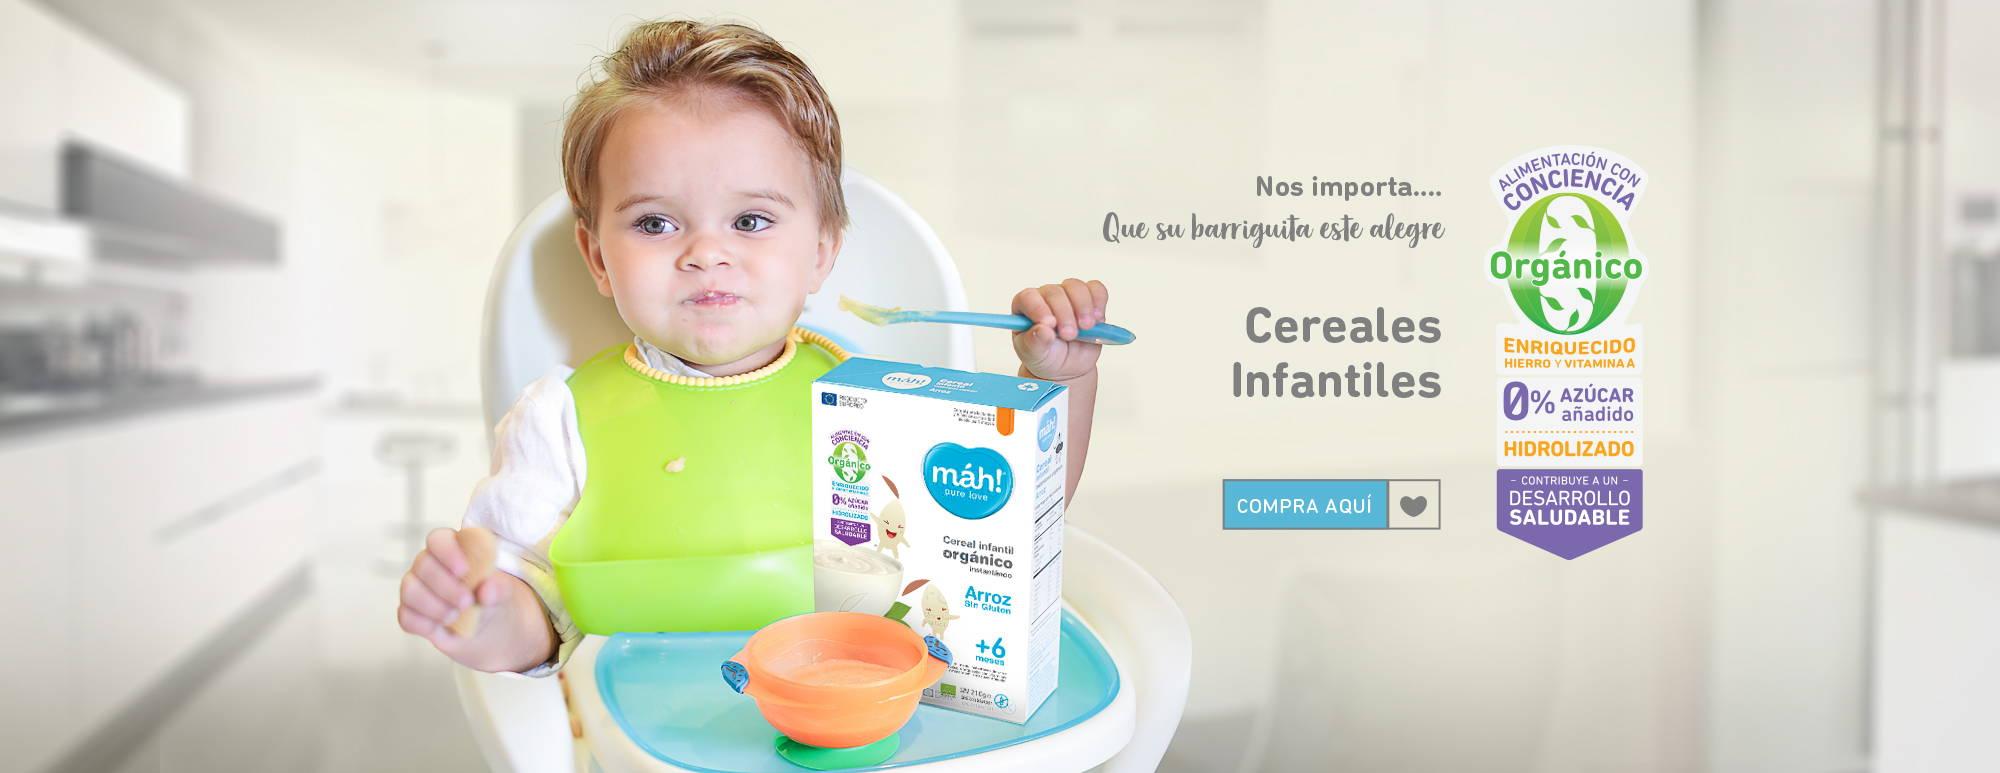 papillas organicas para bebes